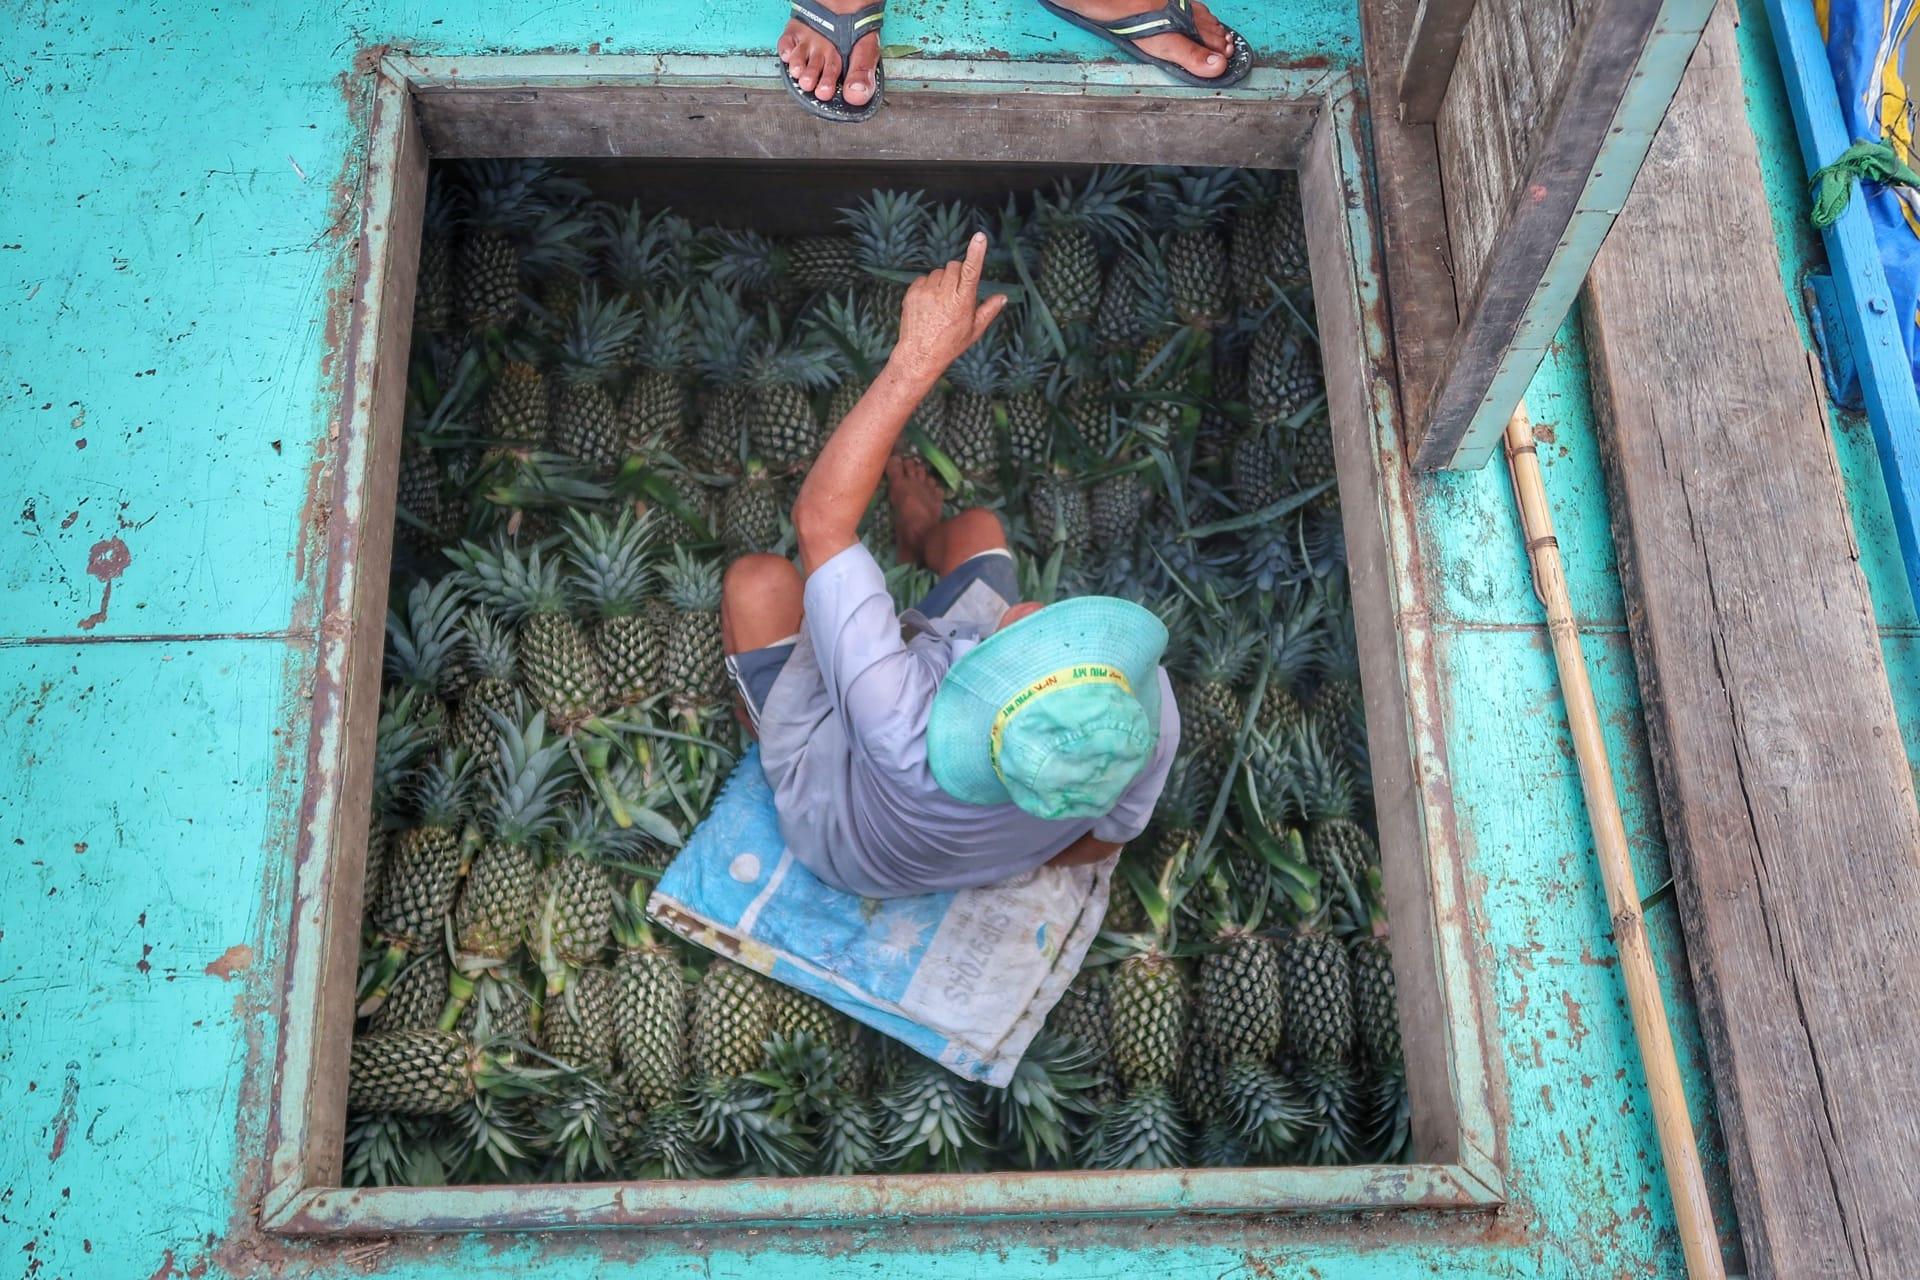 Mekong River, mand sælger ananas